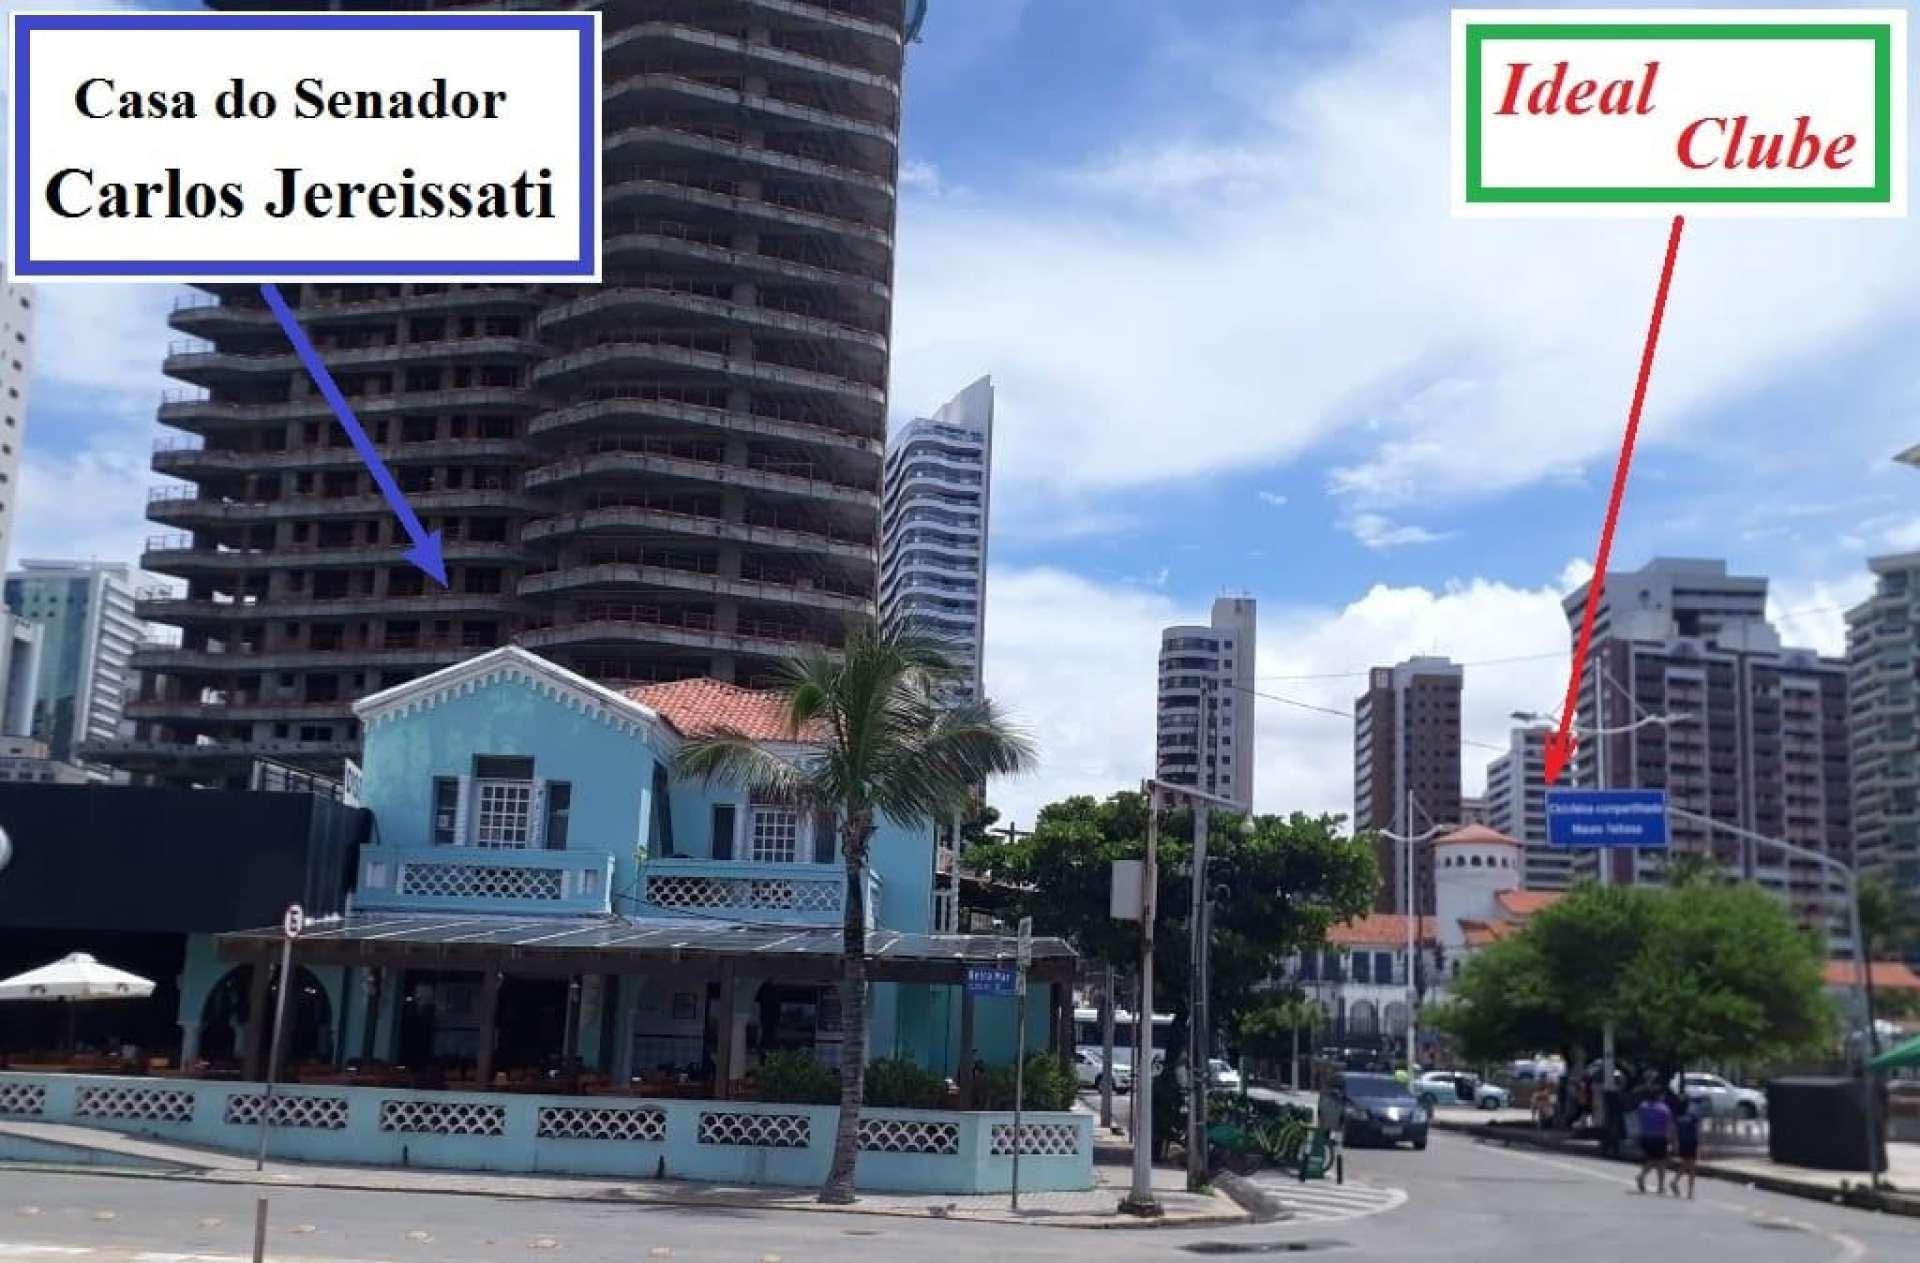 Tombamento do Ideal Clube, na Praia de Iracema, gerou críticas do movimento.